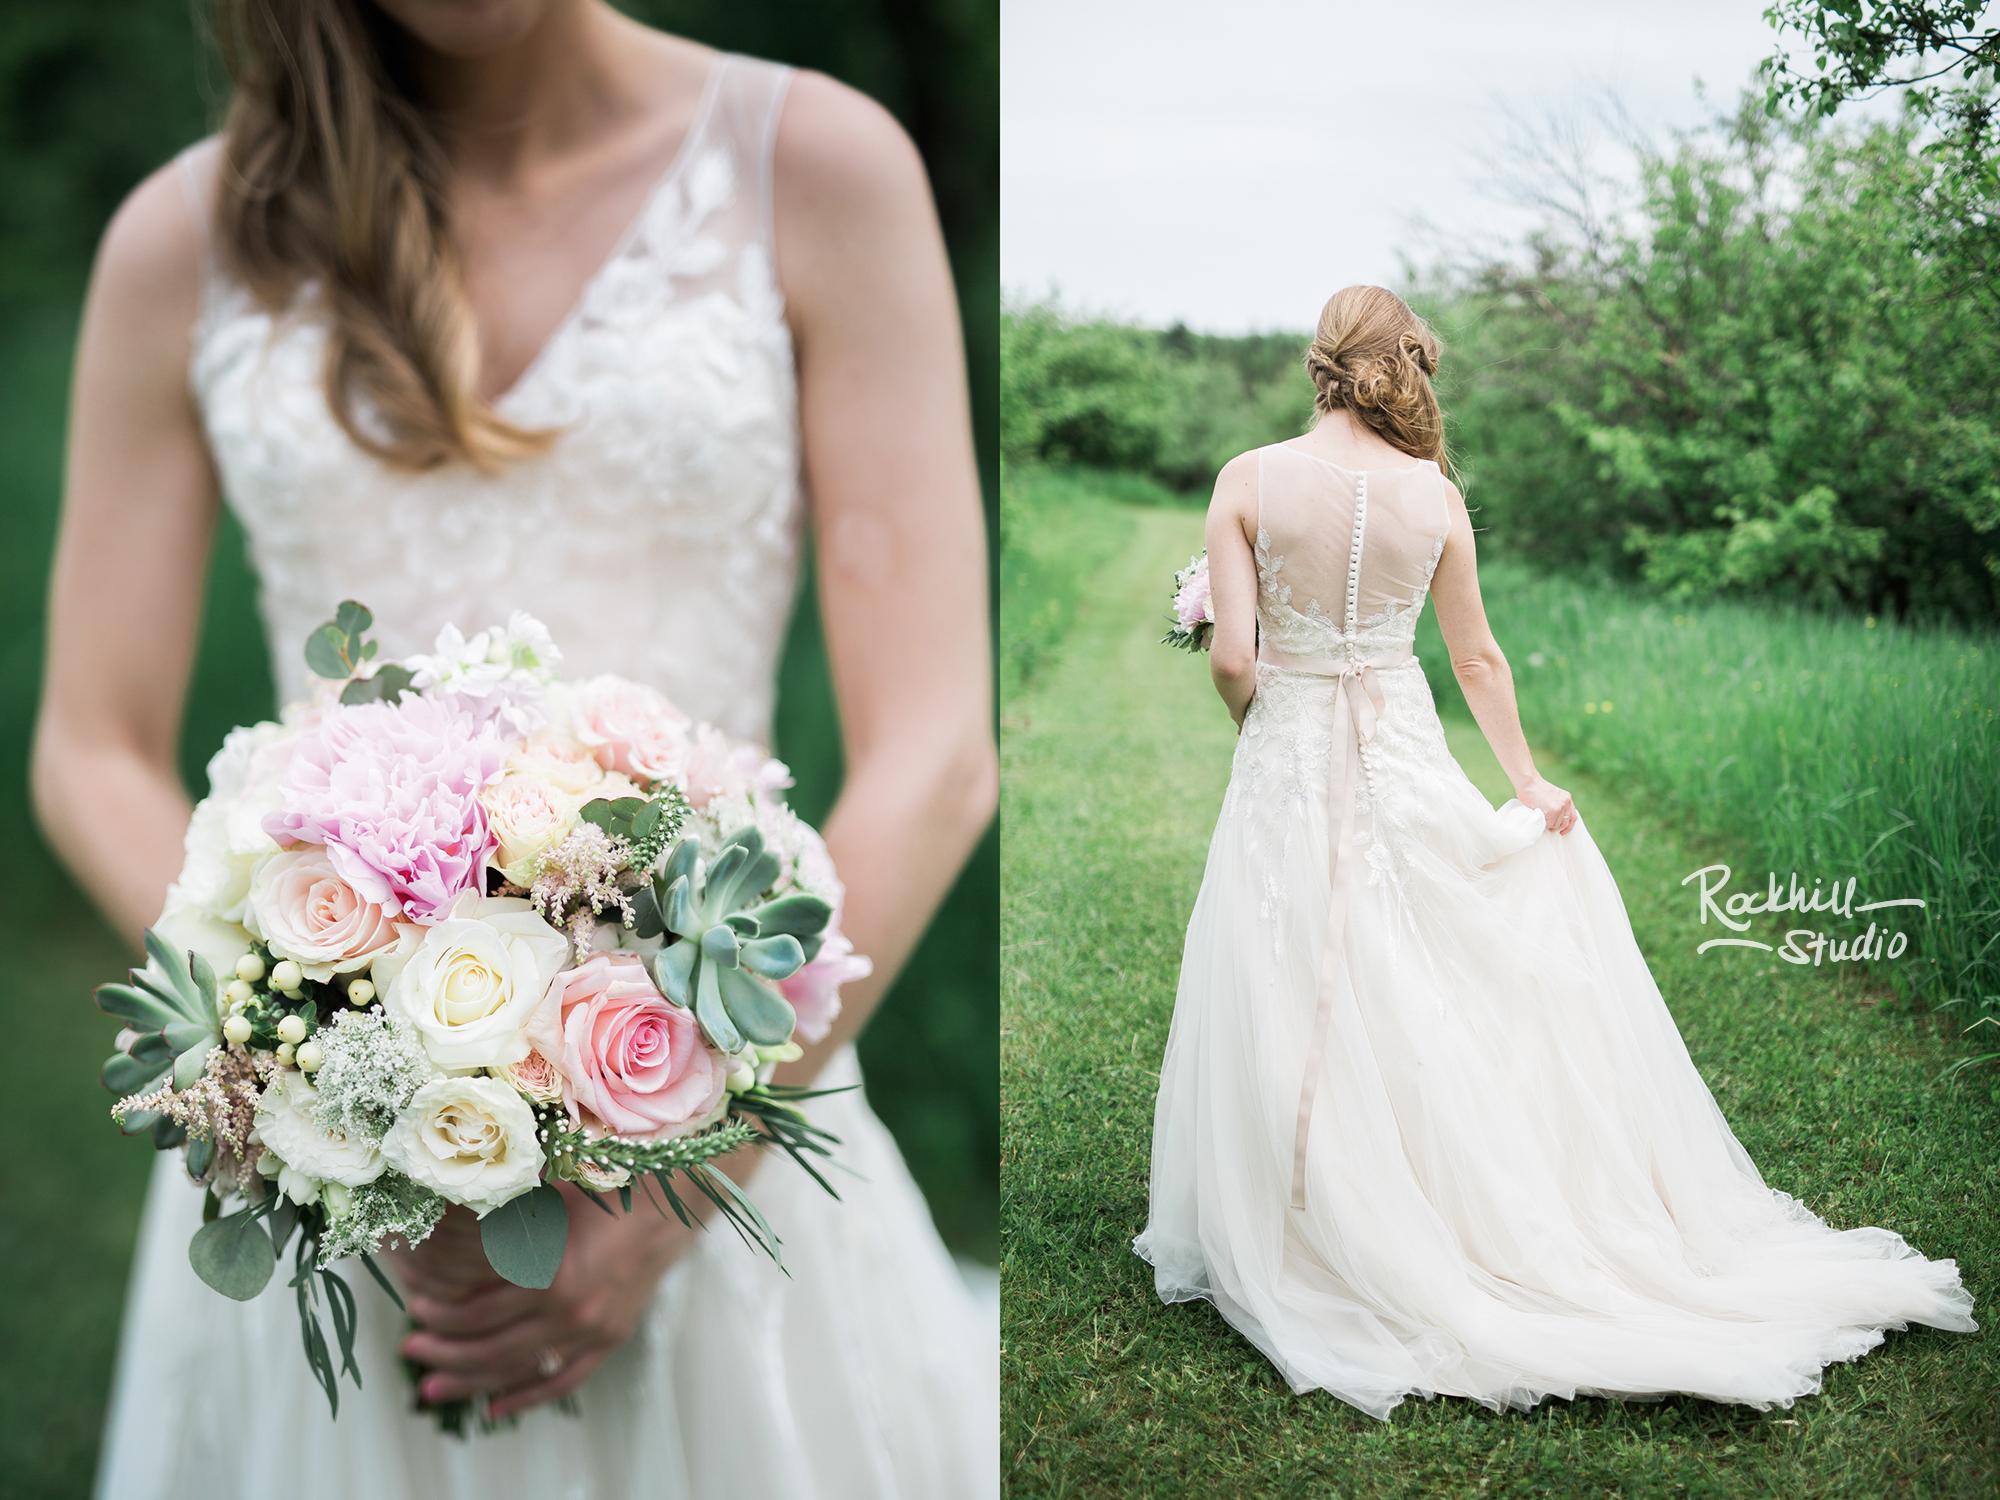 marquette-michigan-wedding-upper-peninsula-spring-photography-rockhill-ee-38.jpg